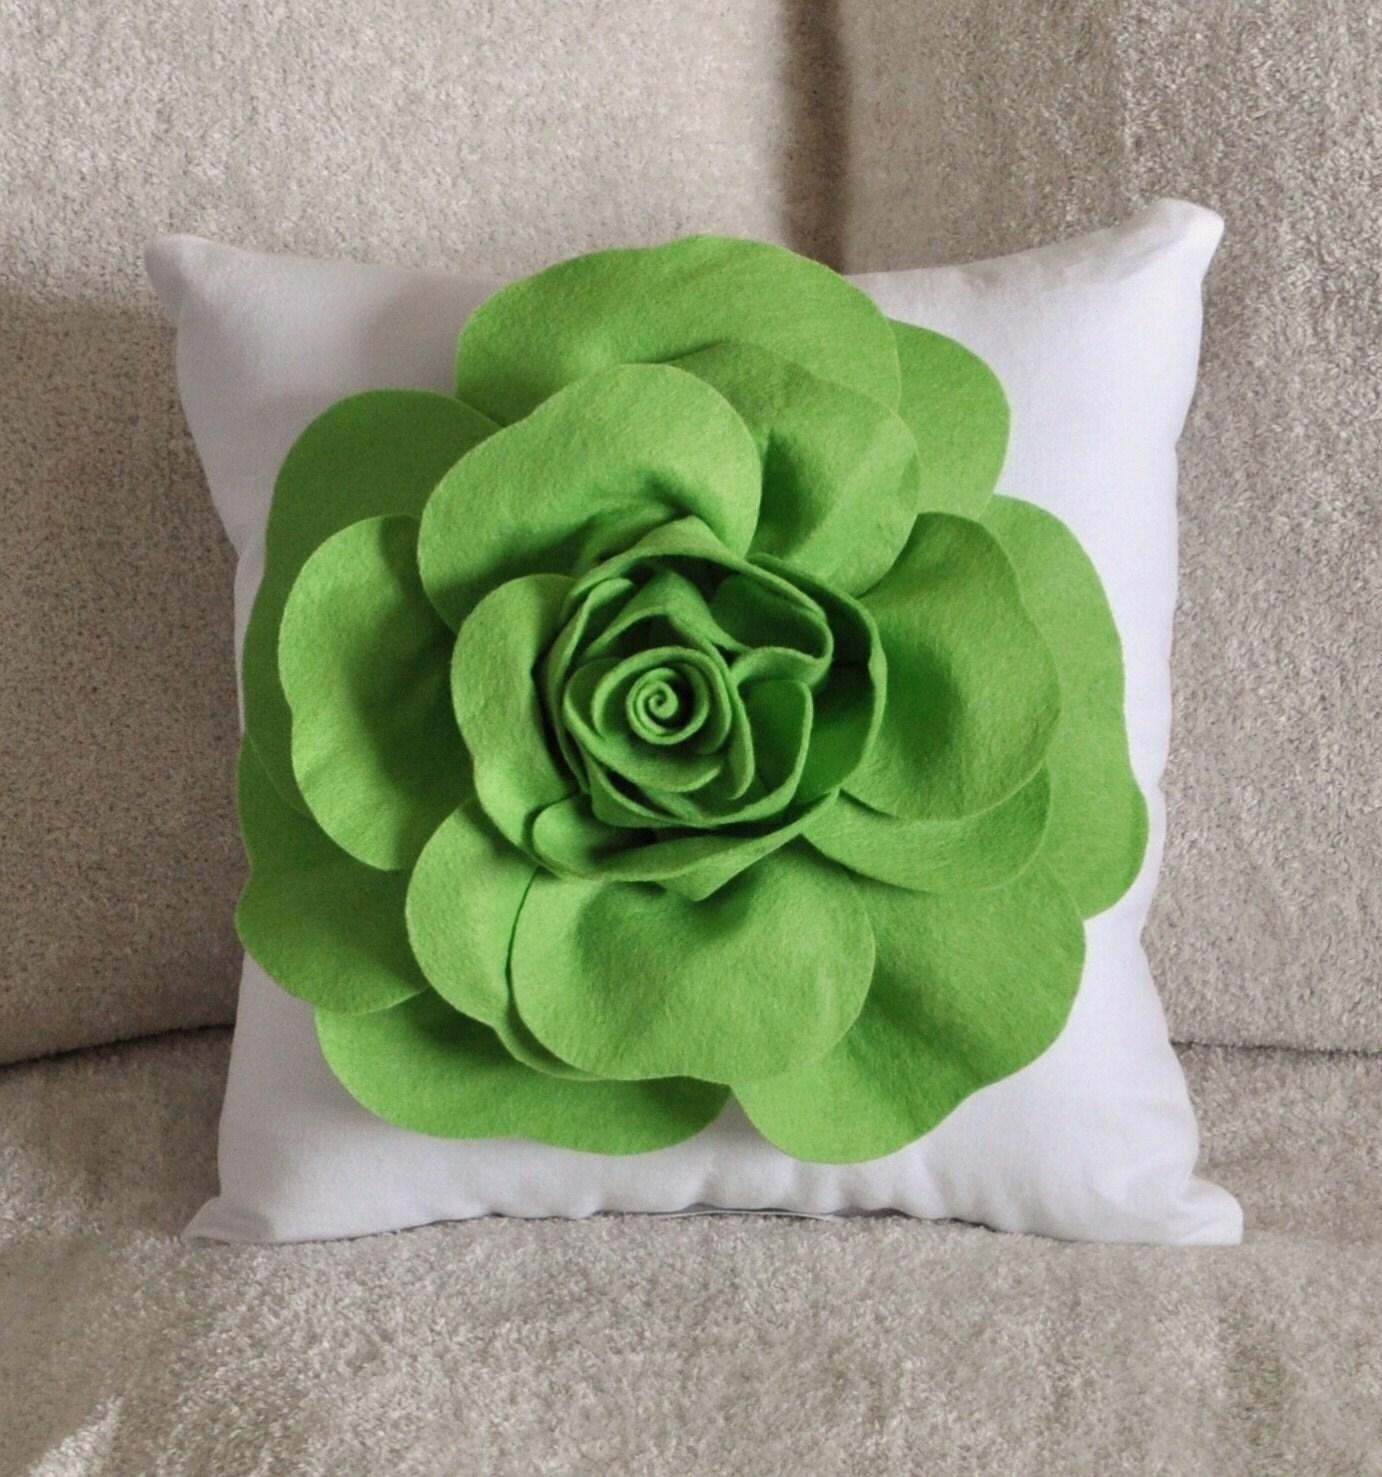 Chartreuse سبز در سفید رز پرتاب بالش بالش لهجه سبز